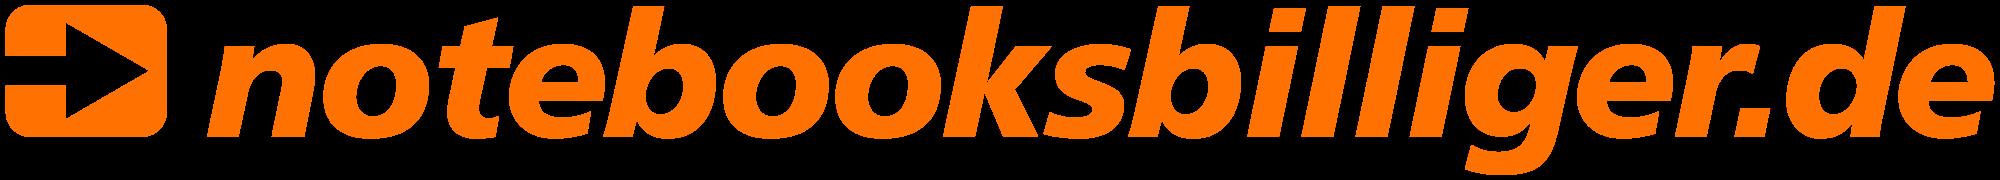 Kodak Alaris Reseller List Logos